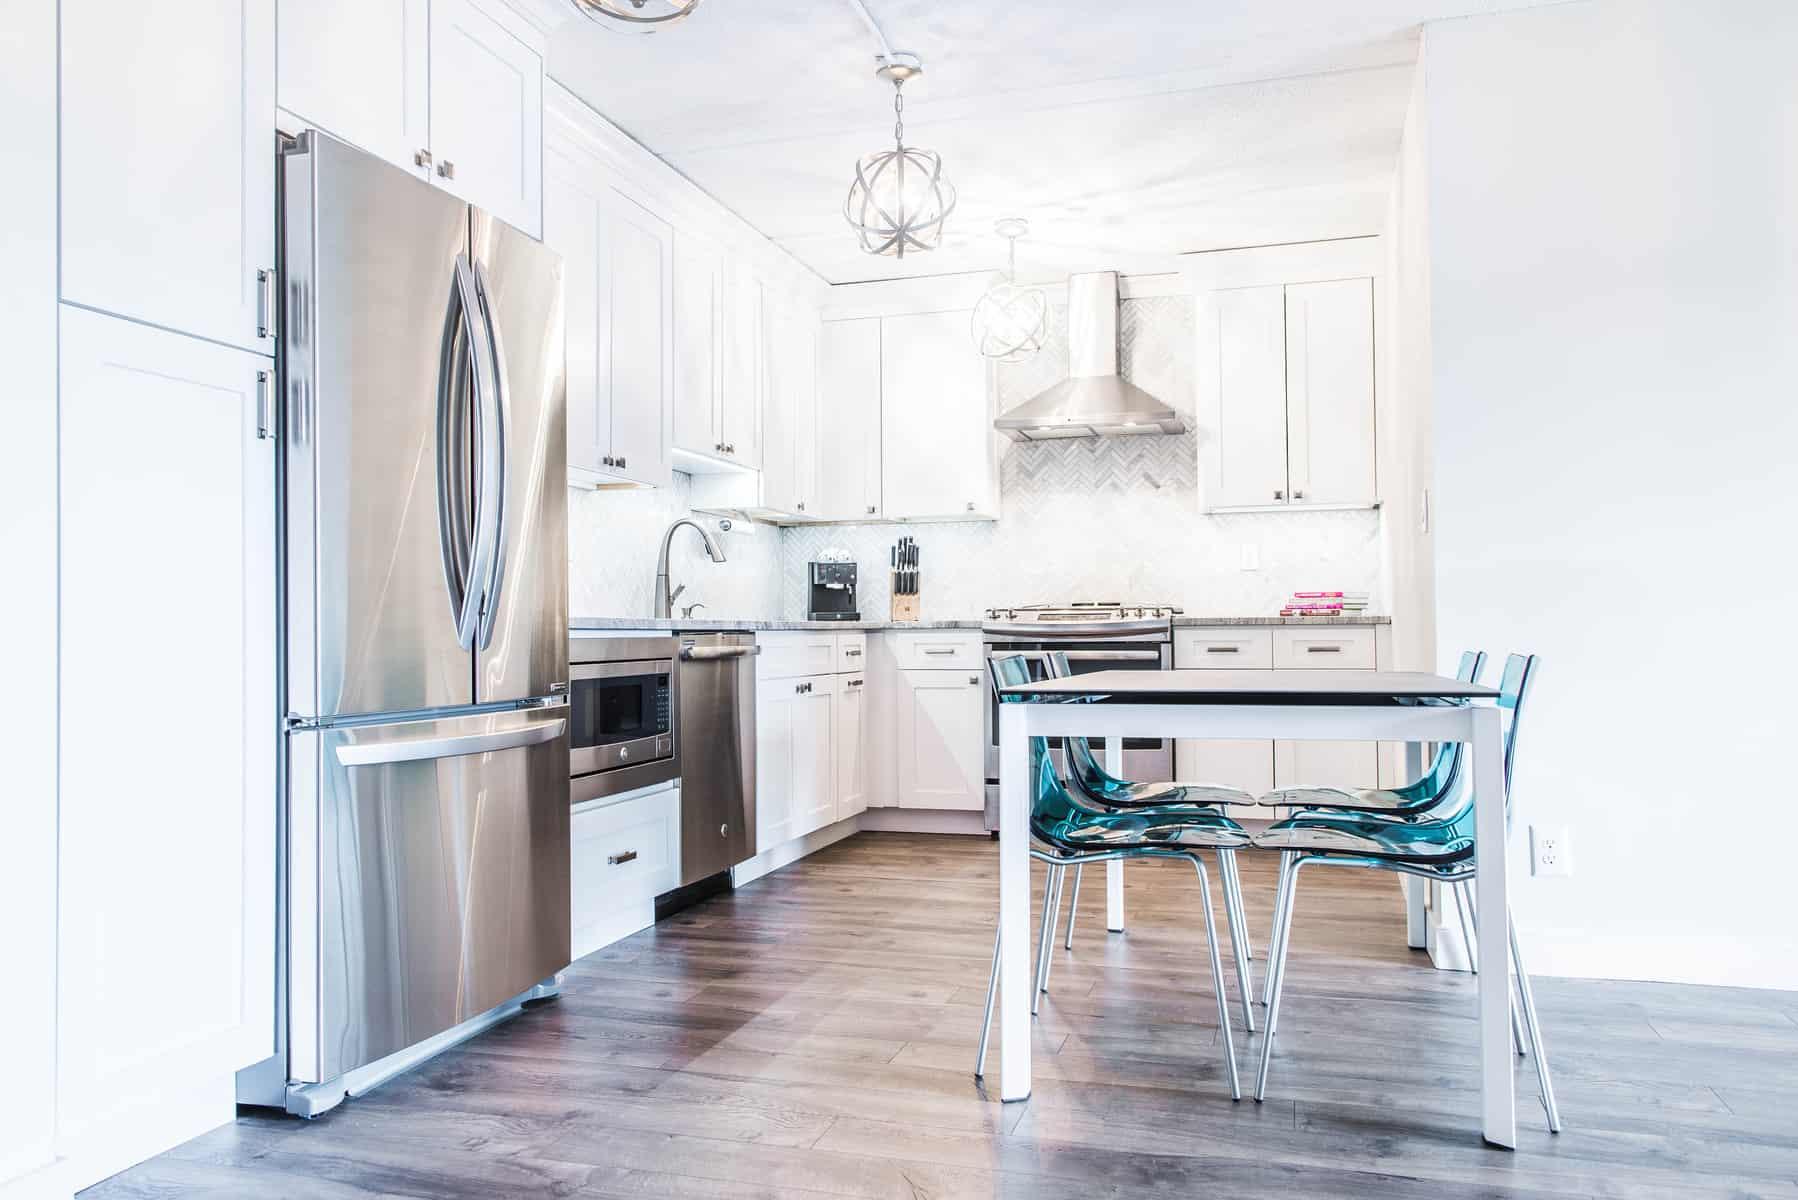 Harrison NY Kitchen remodel by RAJ Kitchen and bath